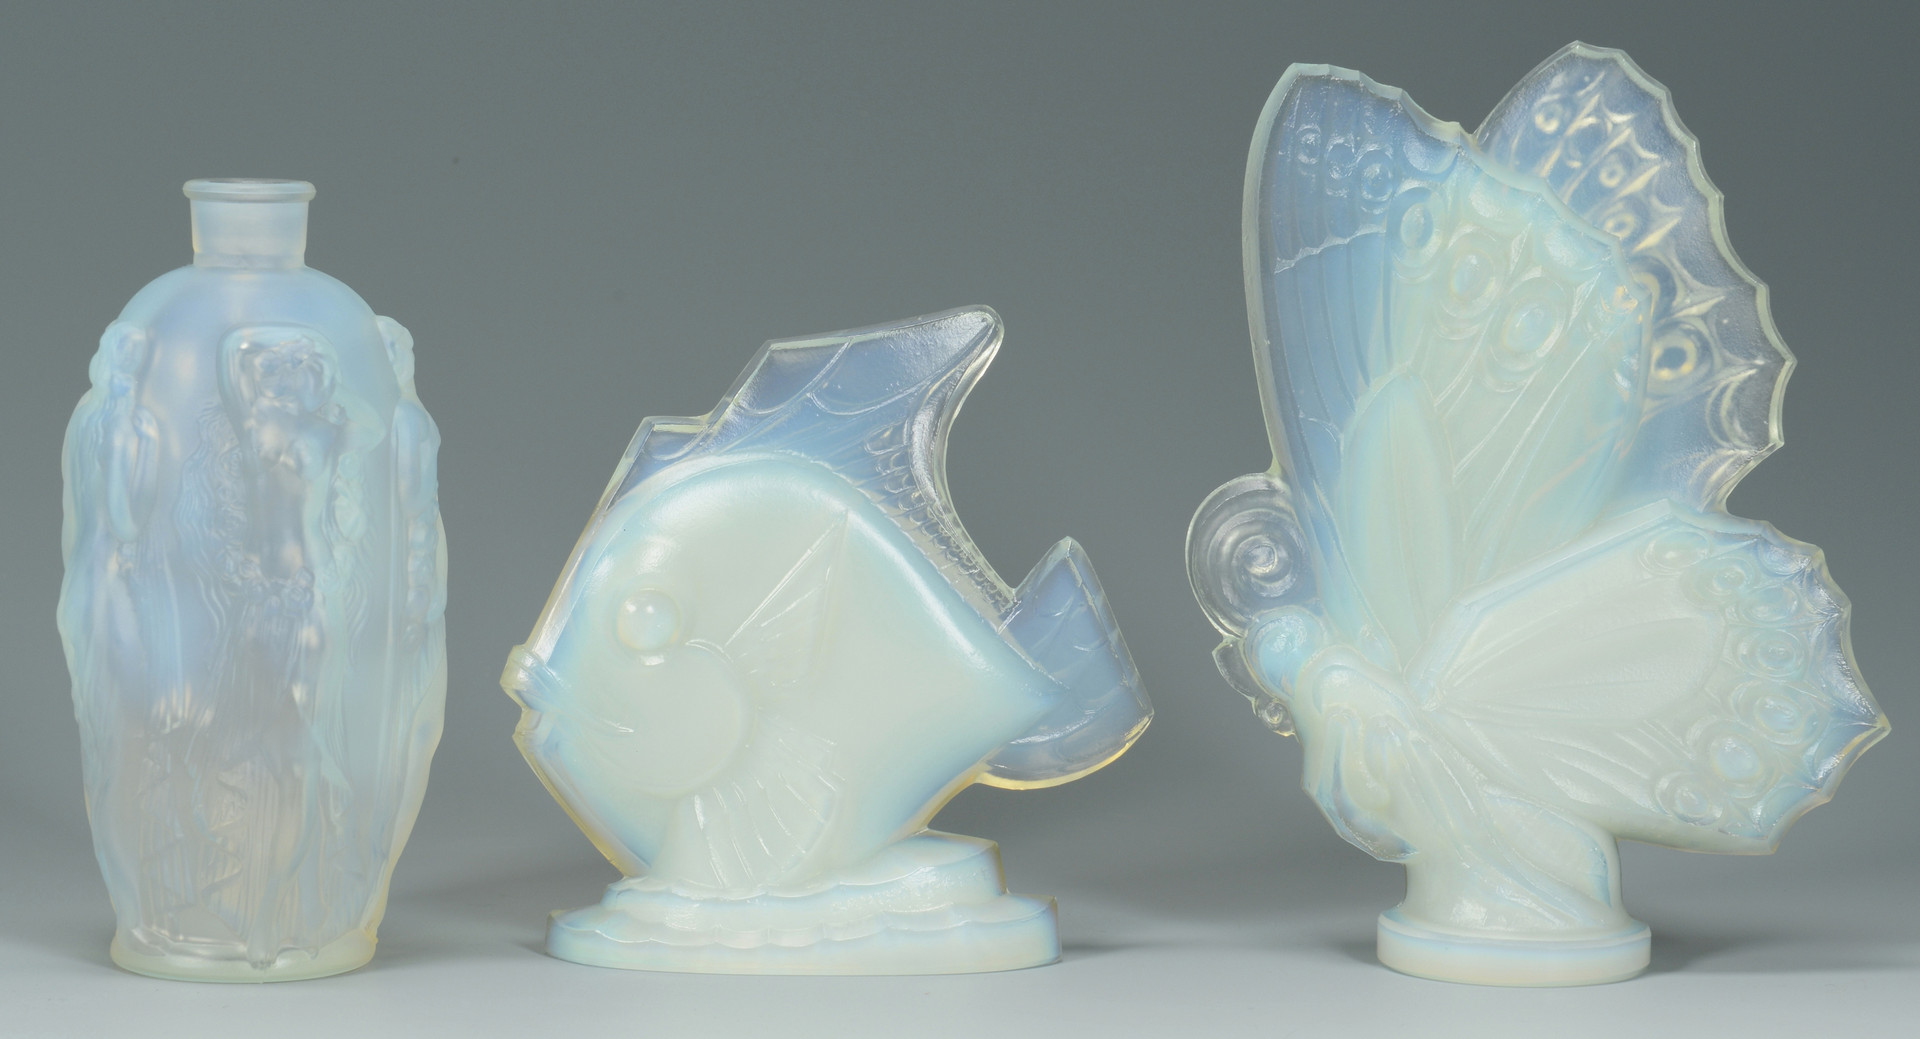 Lot 581: Sabino, Lalique and Steuben Glass, 5 pcs